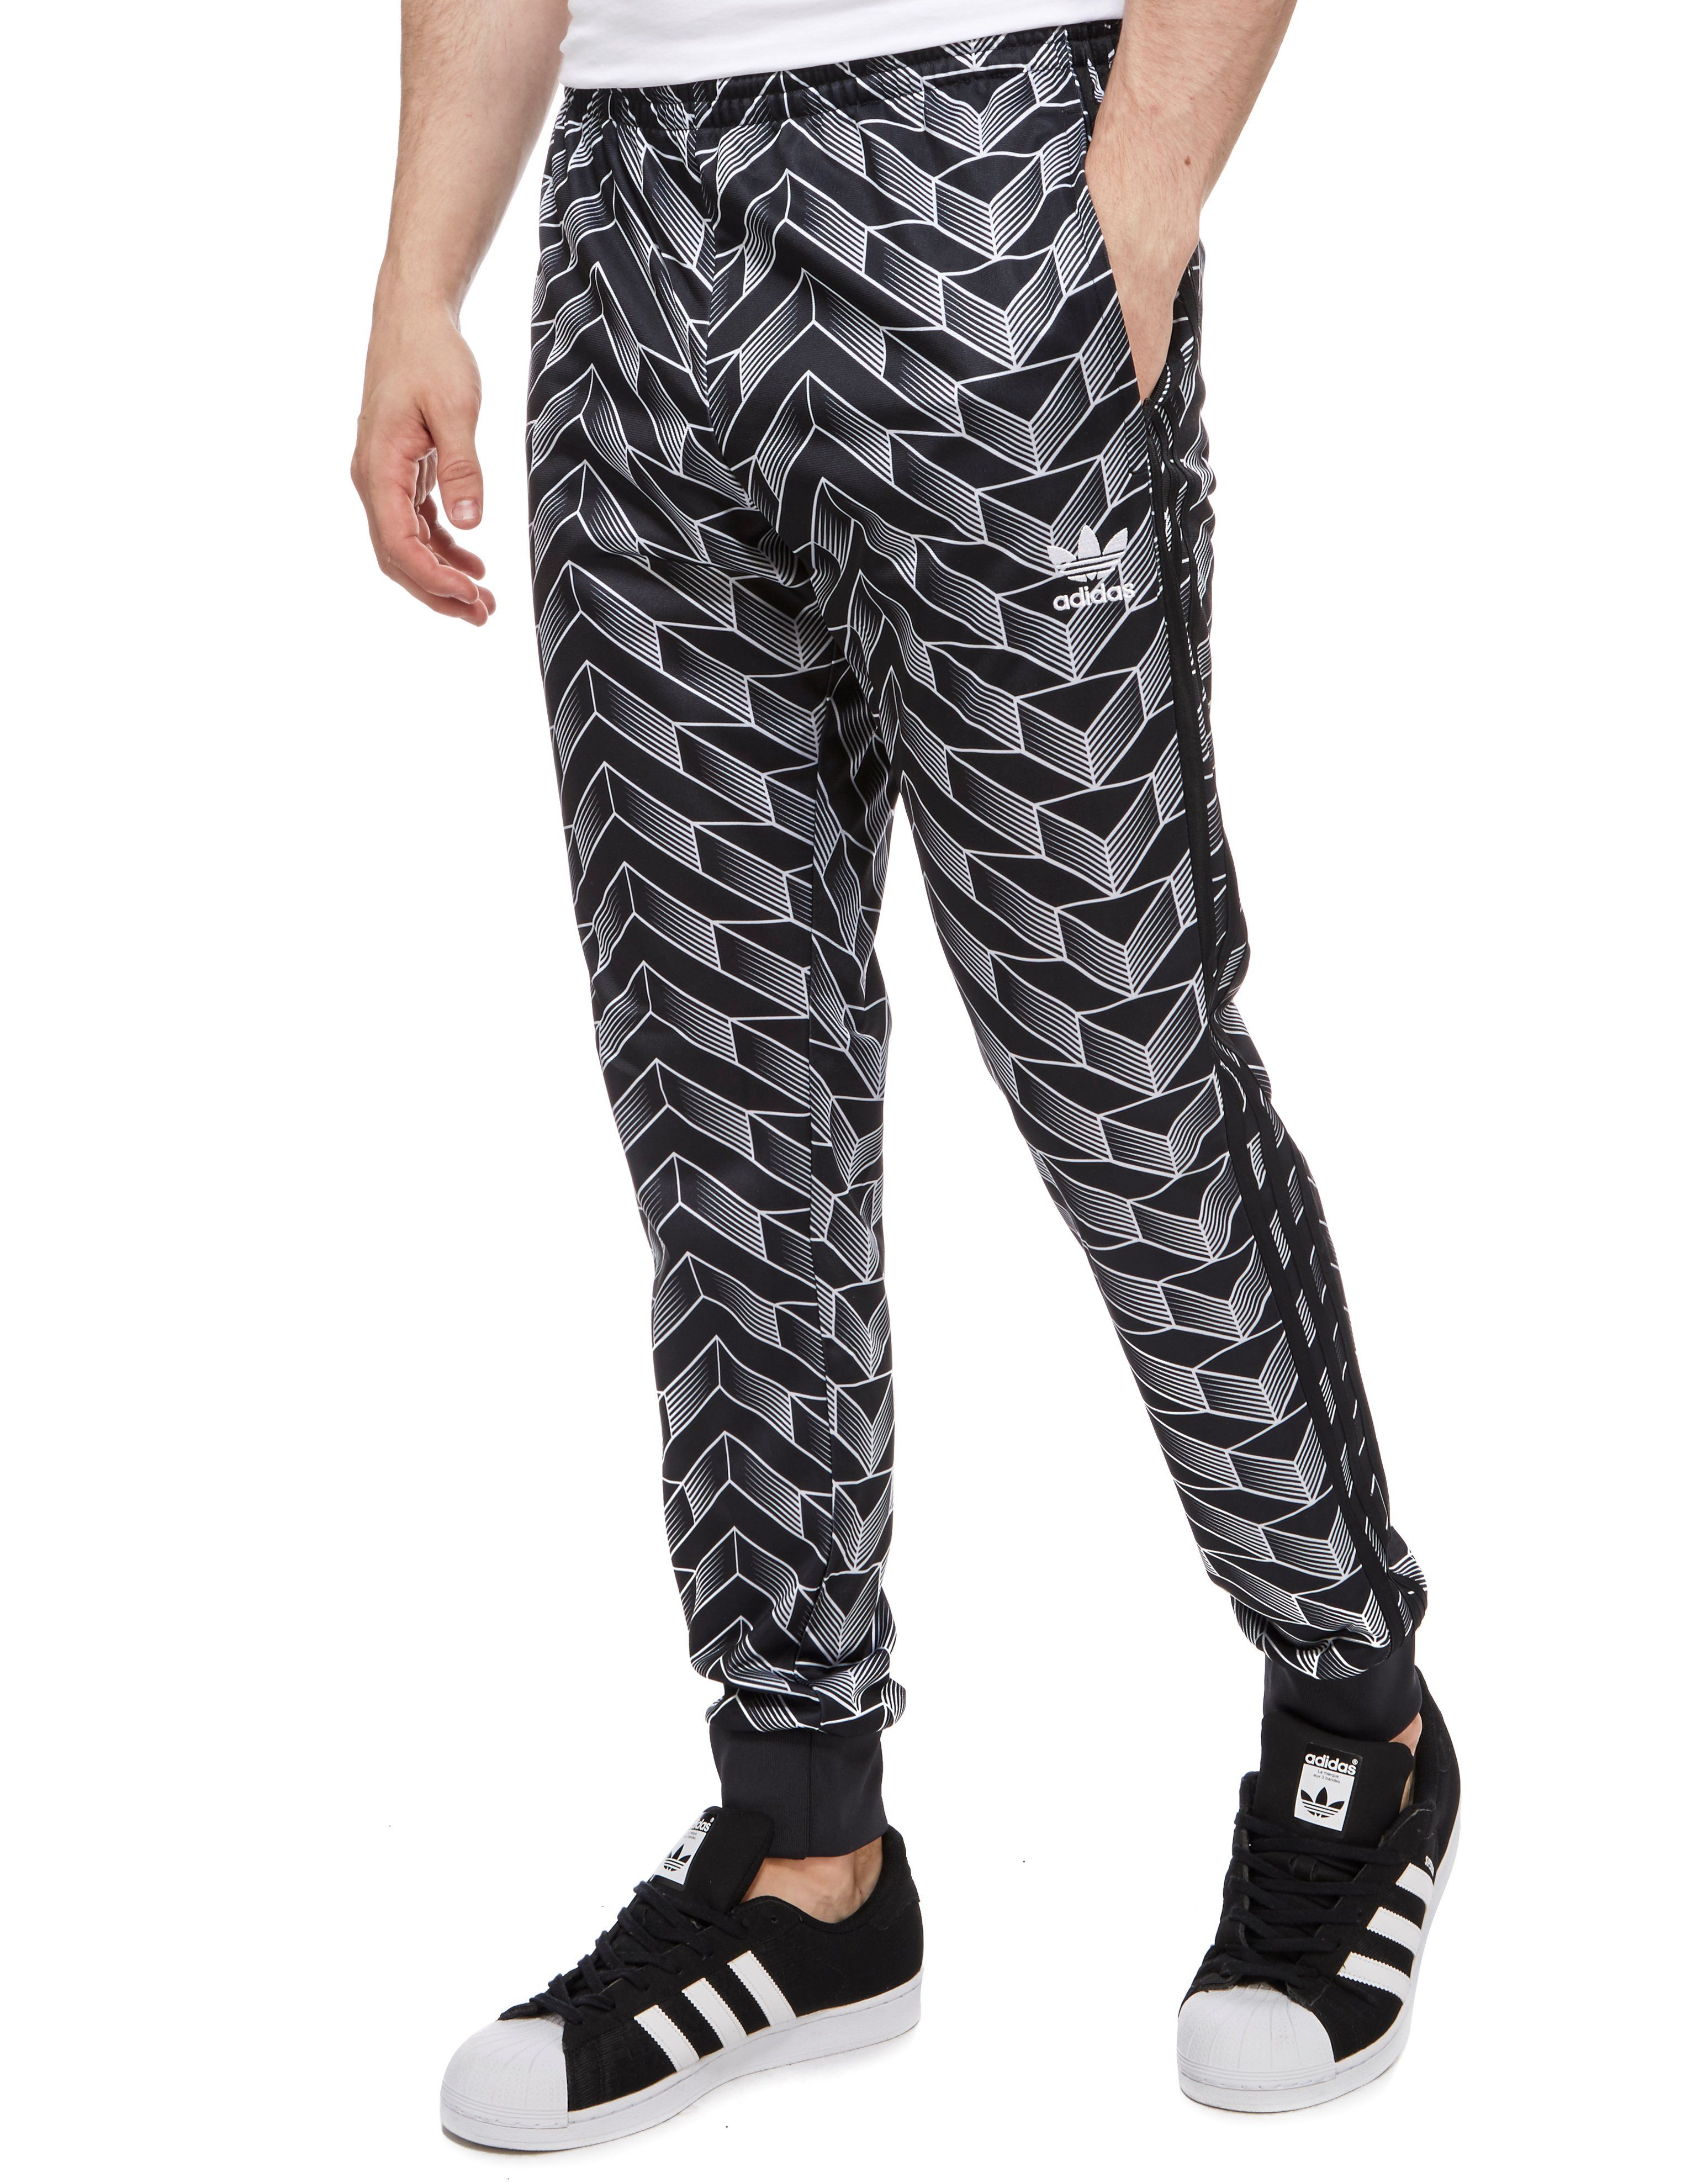 adidas Originals Premium Spacedye Pants